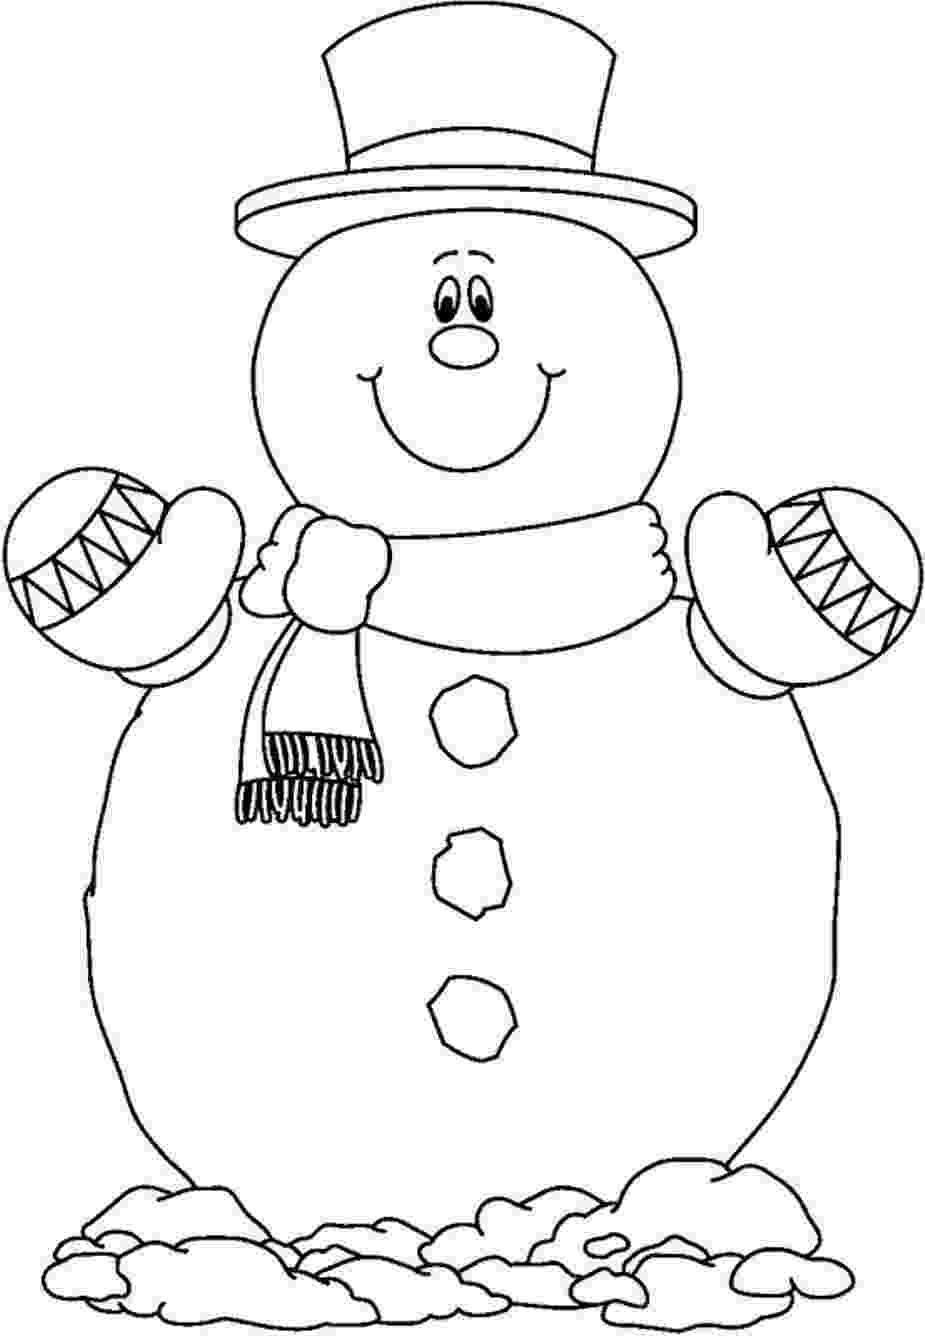 snowmancoloring sheets making a snowman coloring page crayolacom sheets snowmancoloring